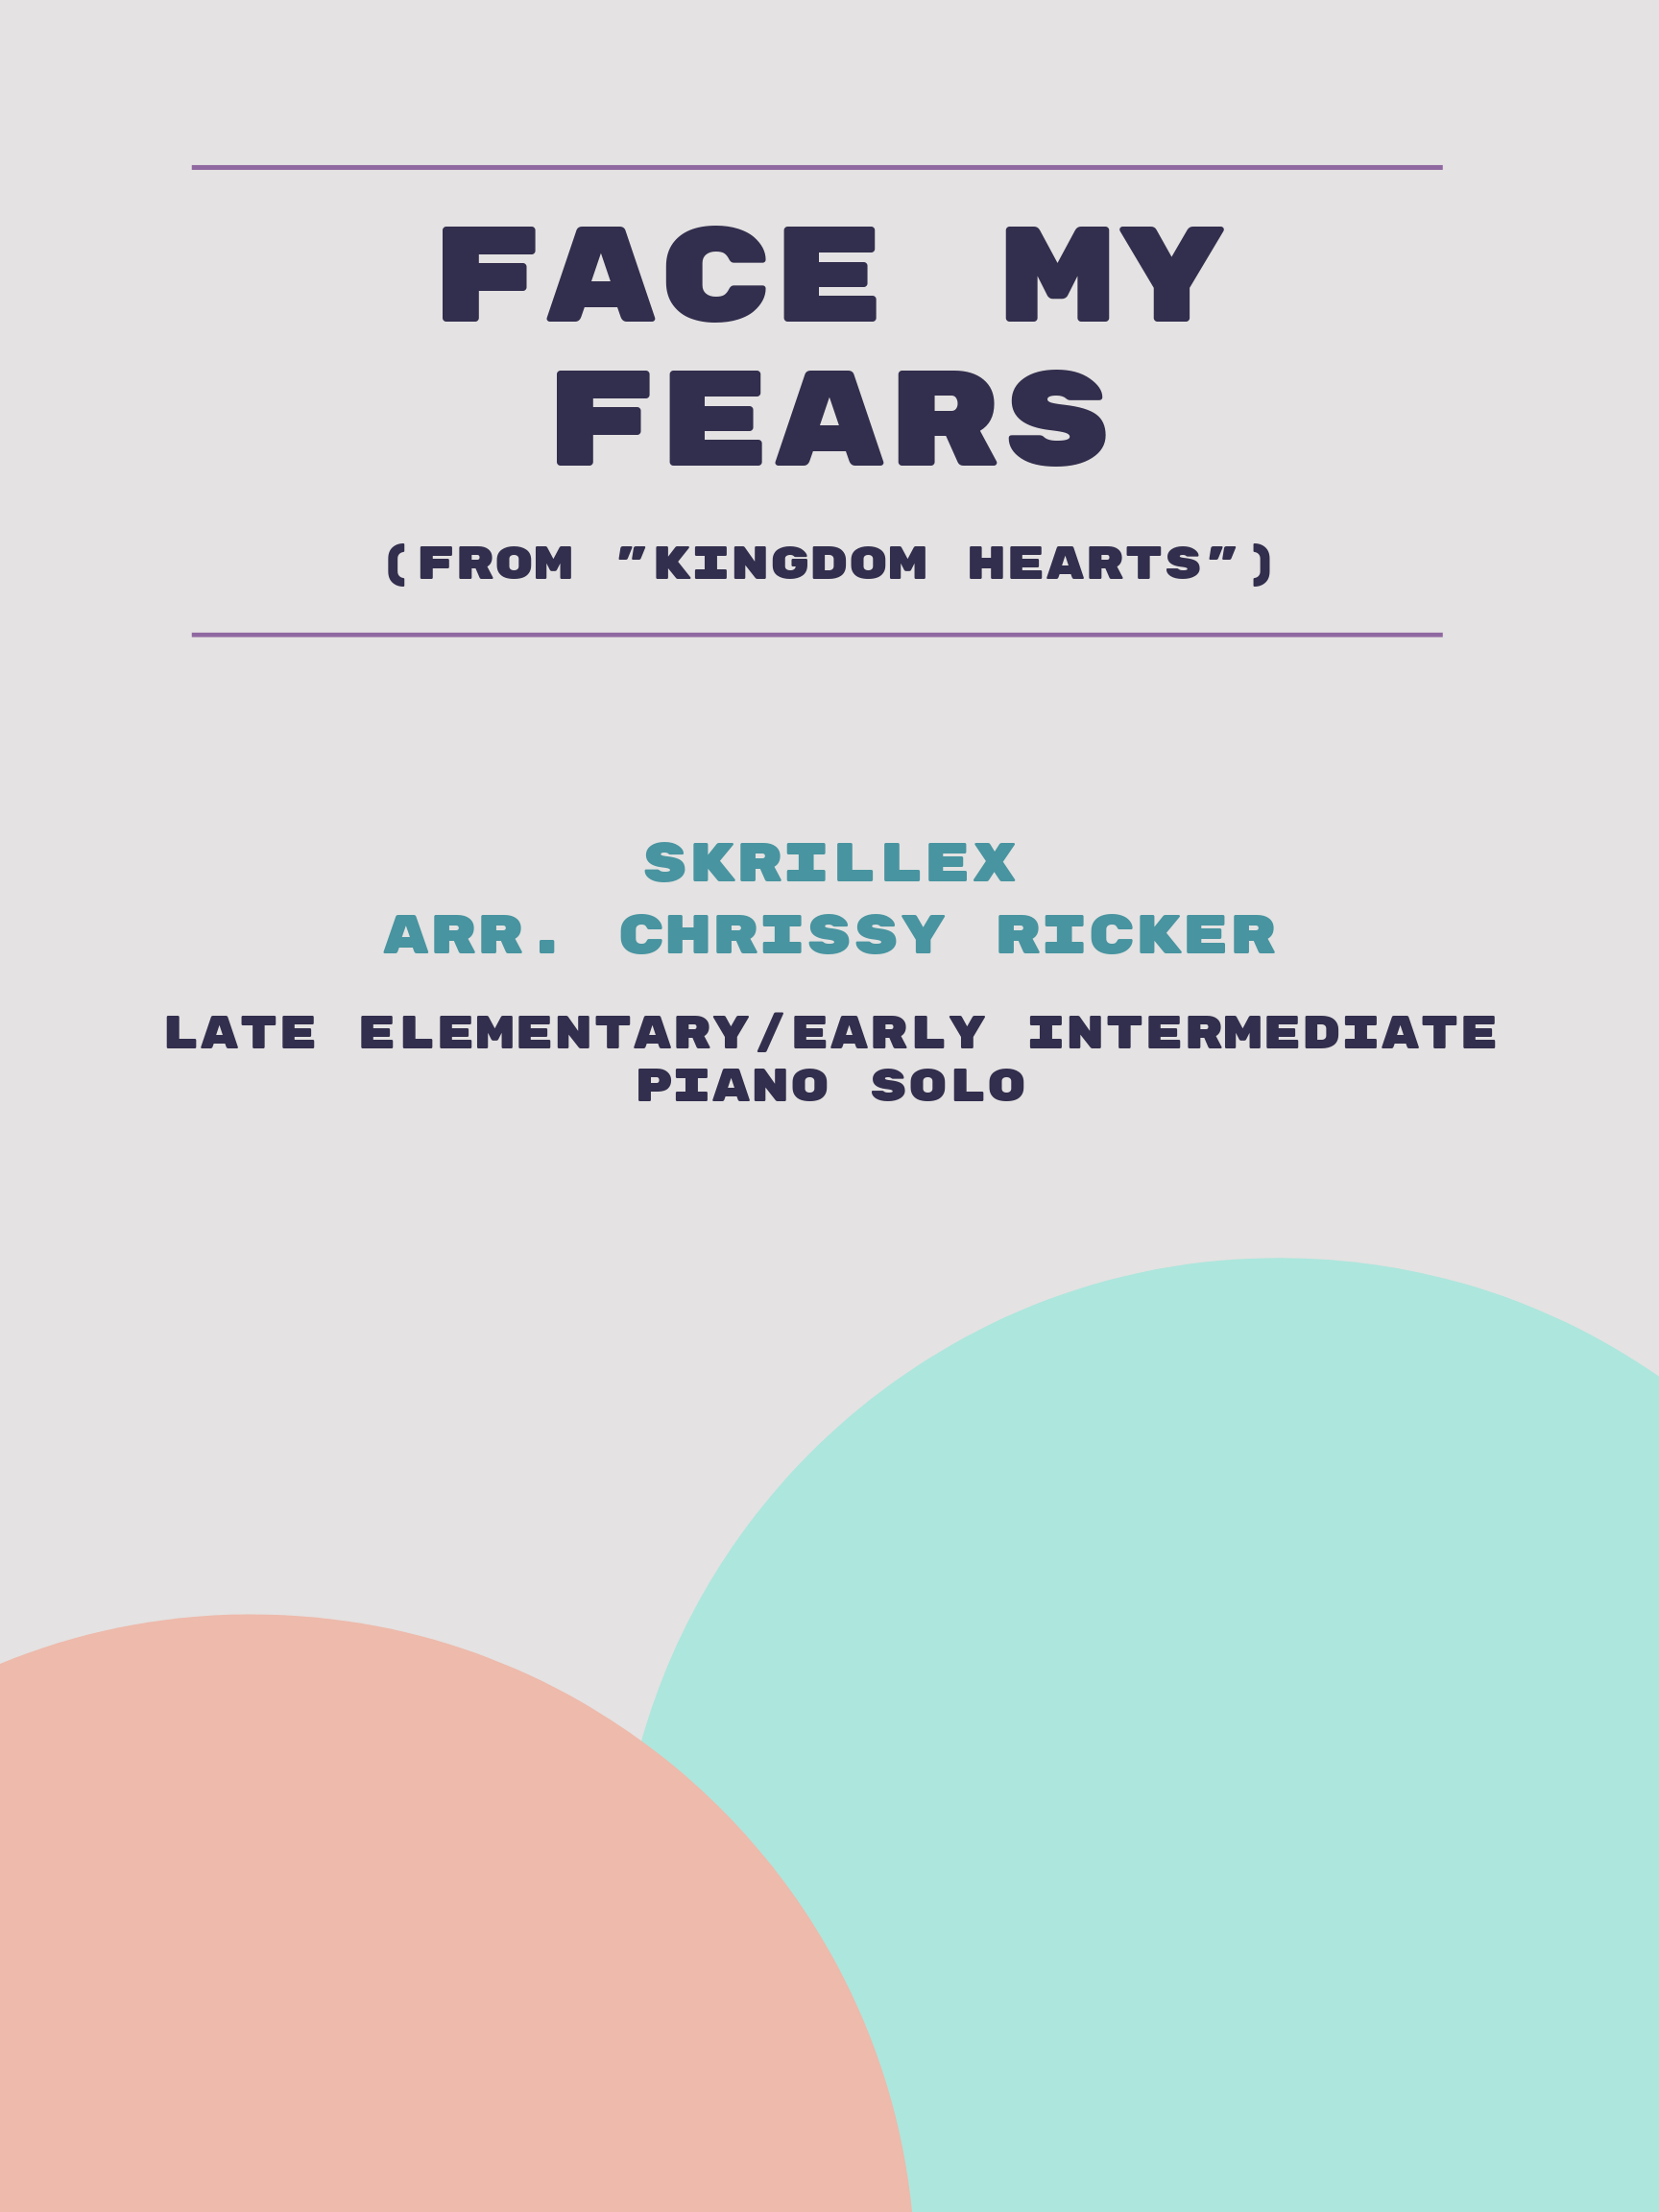 Face My Fears by Skrillex